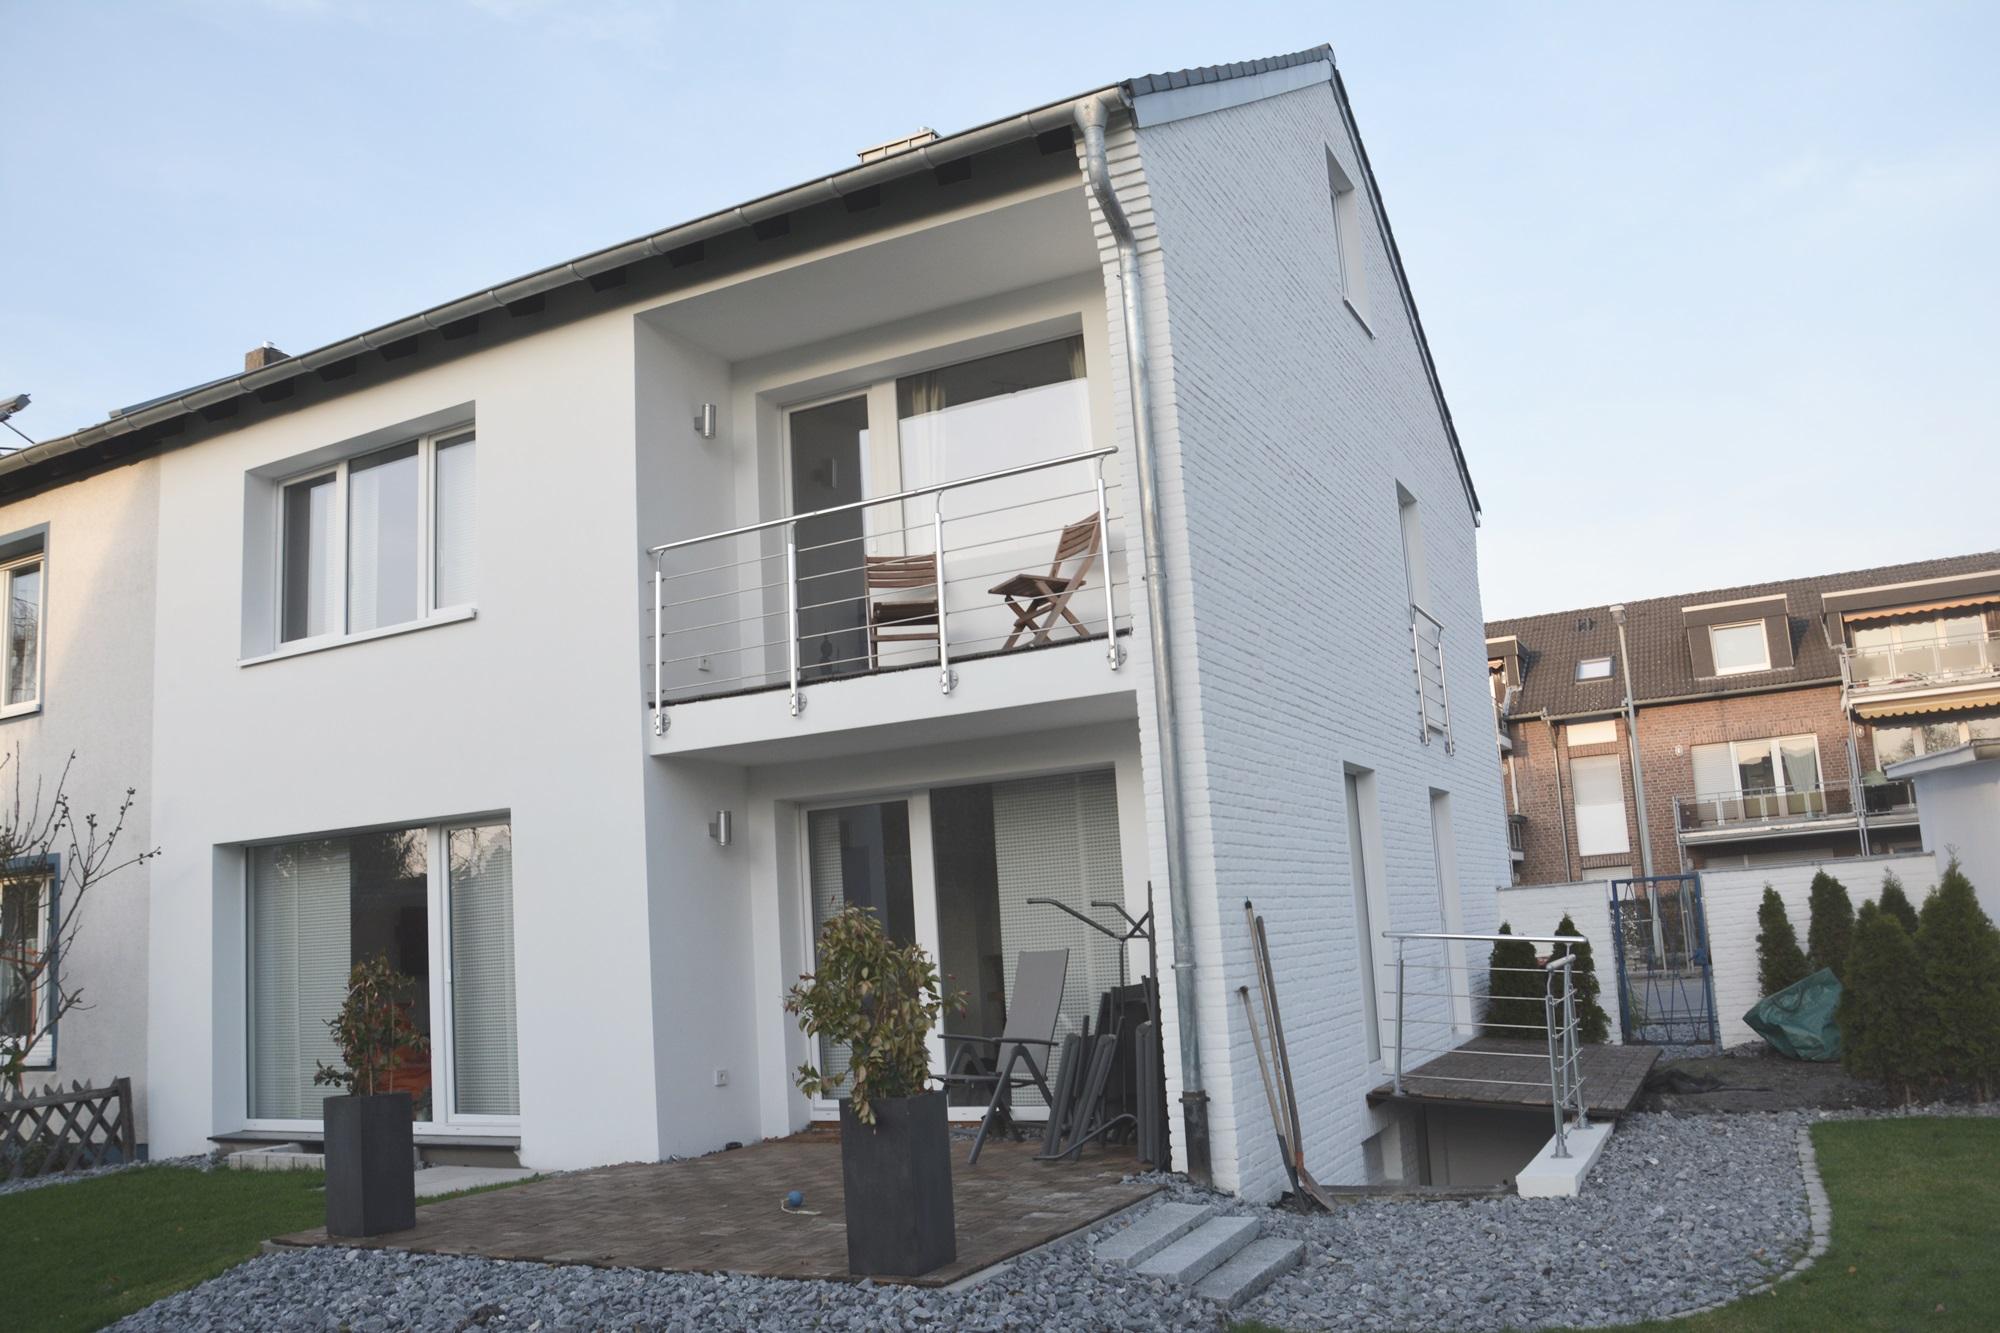 krefeld stadtwald top modernisierte doppelhaush lfte mit garten dorothea reymann immobilien. Black Bedroom Furniture Sets. Home Design Ideas